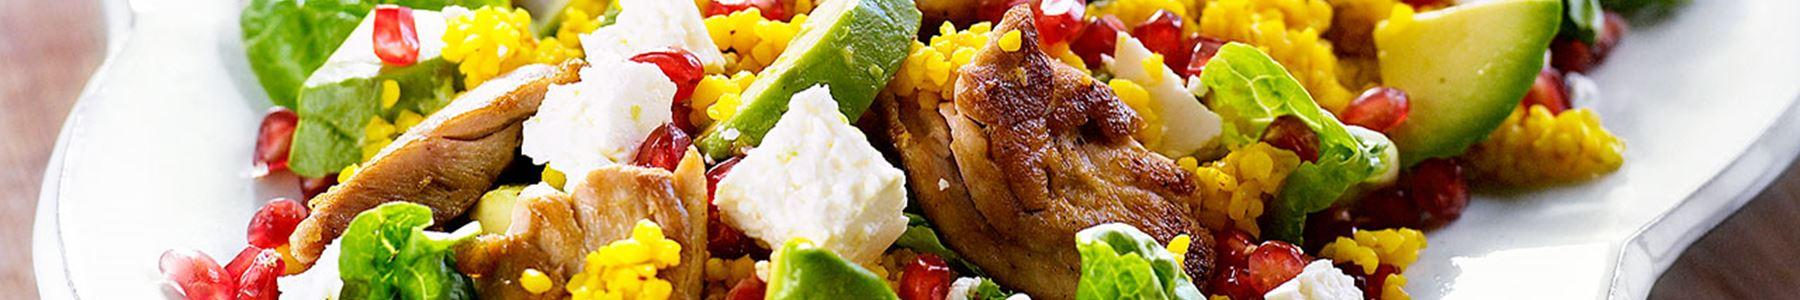 Kyckling + Baguette + Sallad